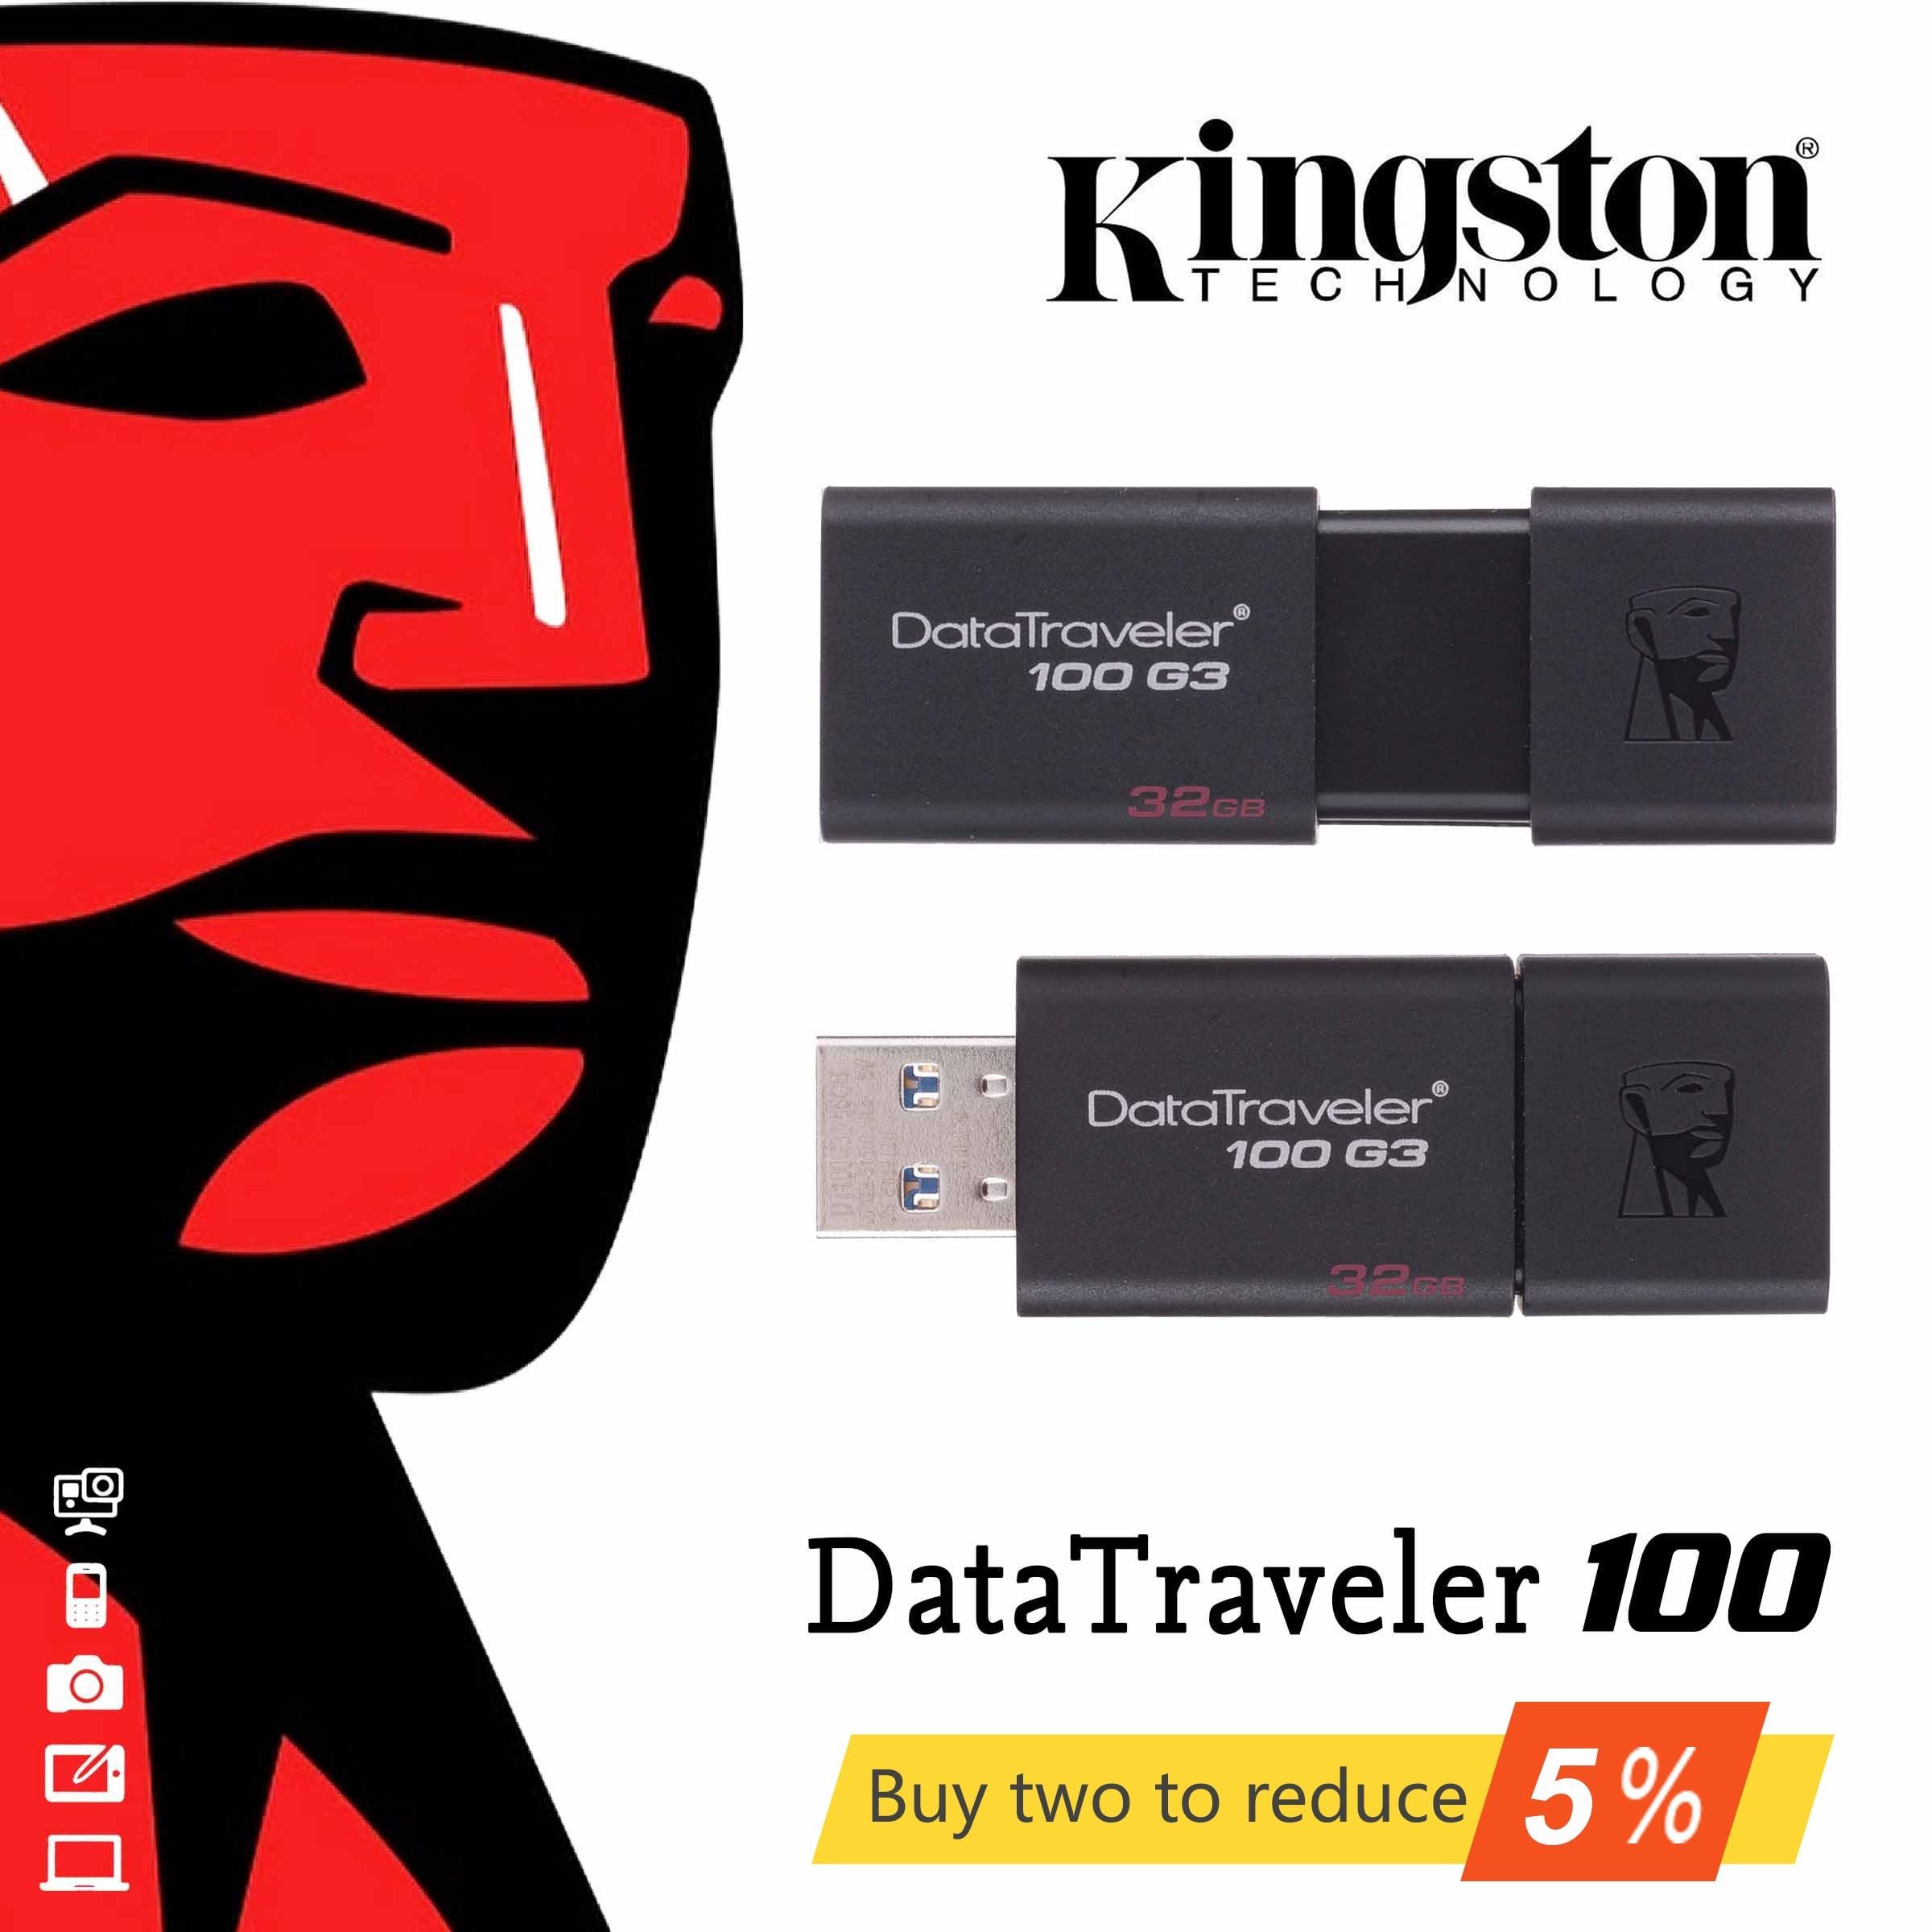 Original Kingston DataTraveler 100 G3 USB Flash Drives 16GB 32GB 64GB 128GB USB 3.0 Pen Drive High Speed PenDrives DT100G3